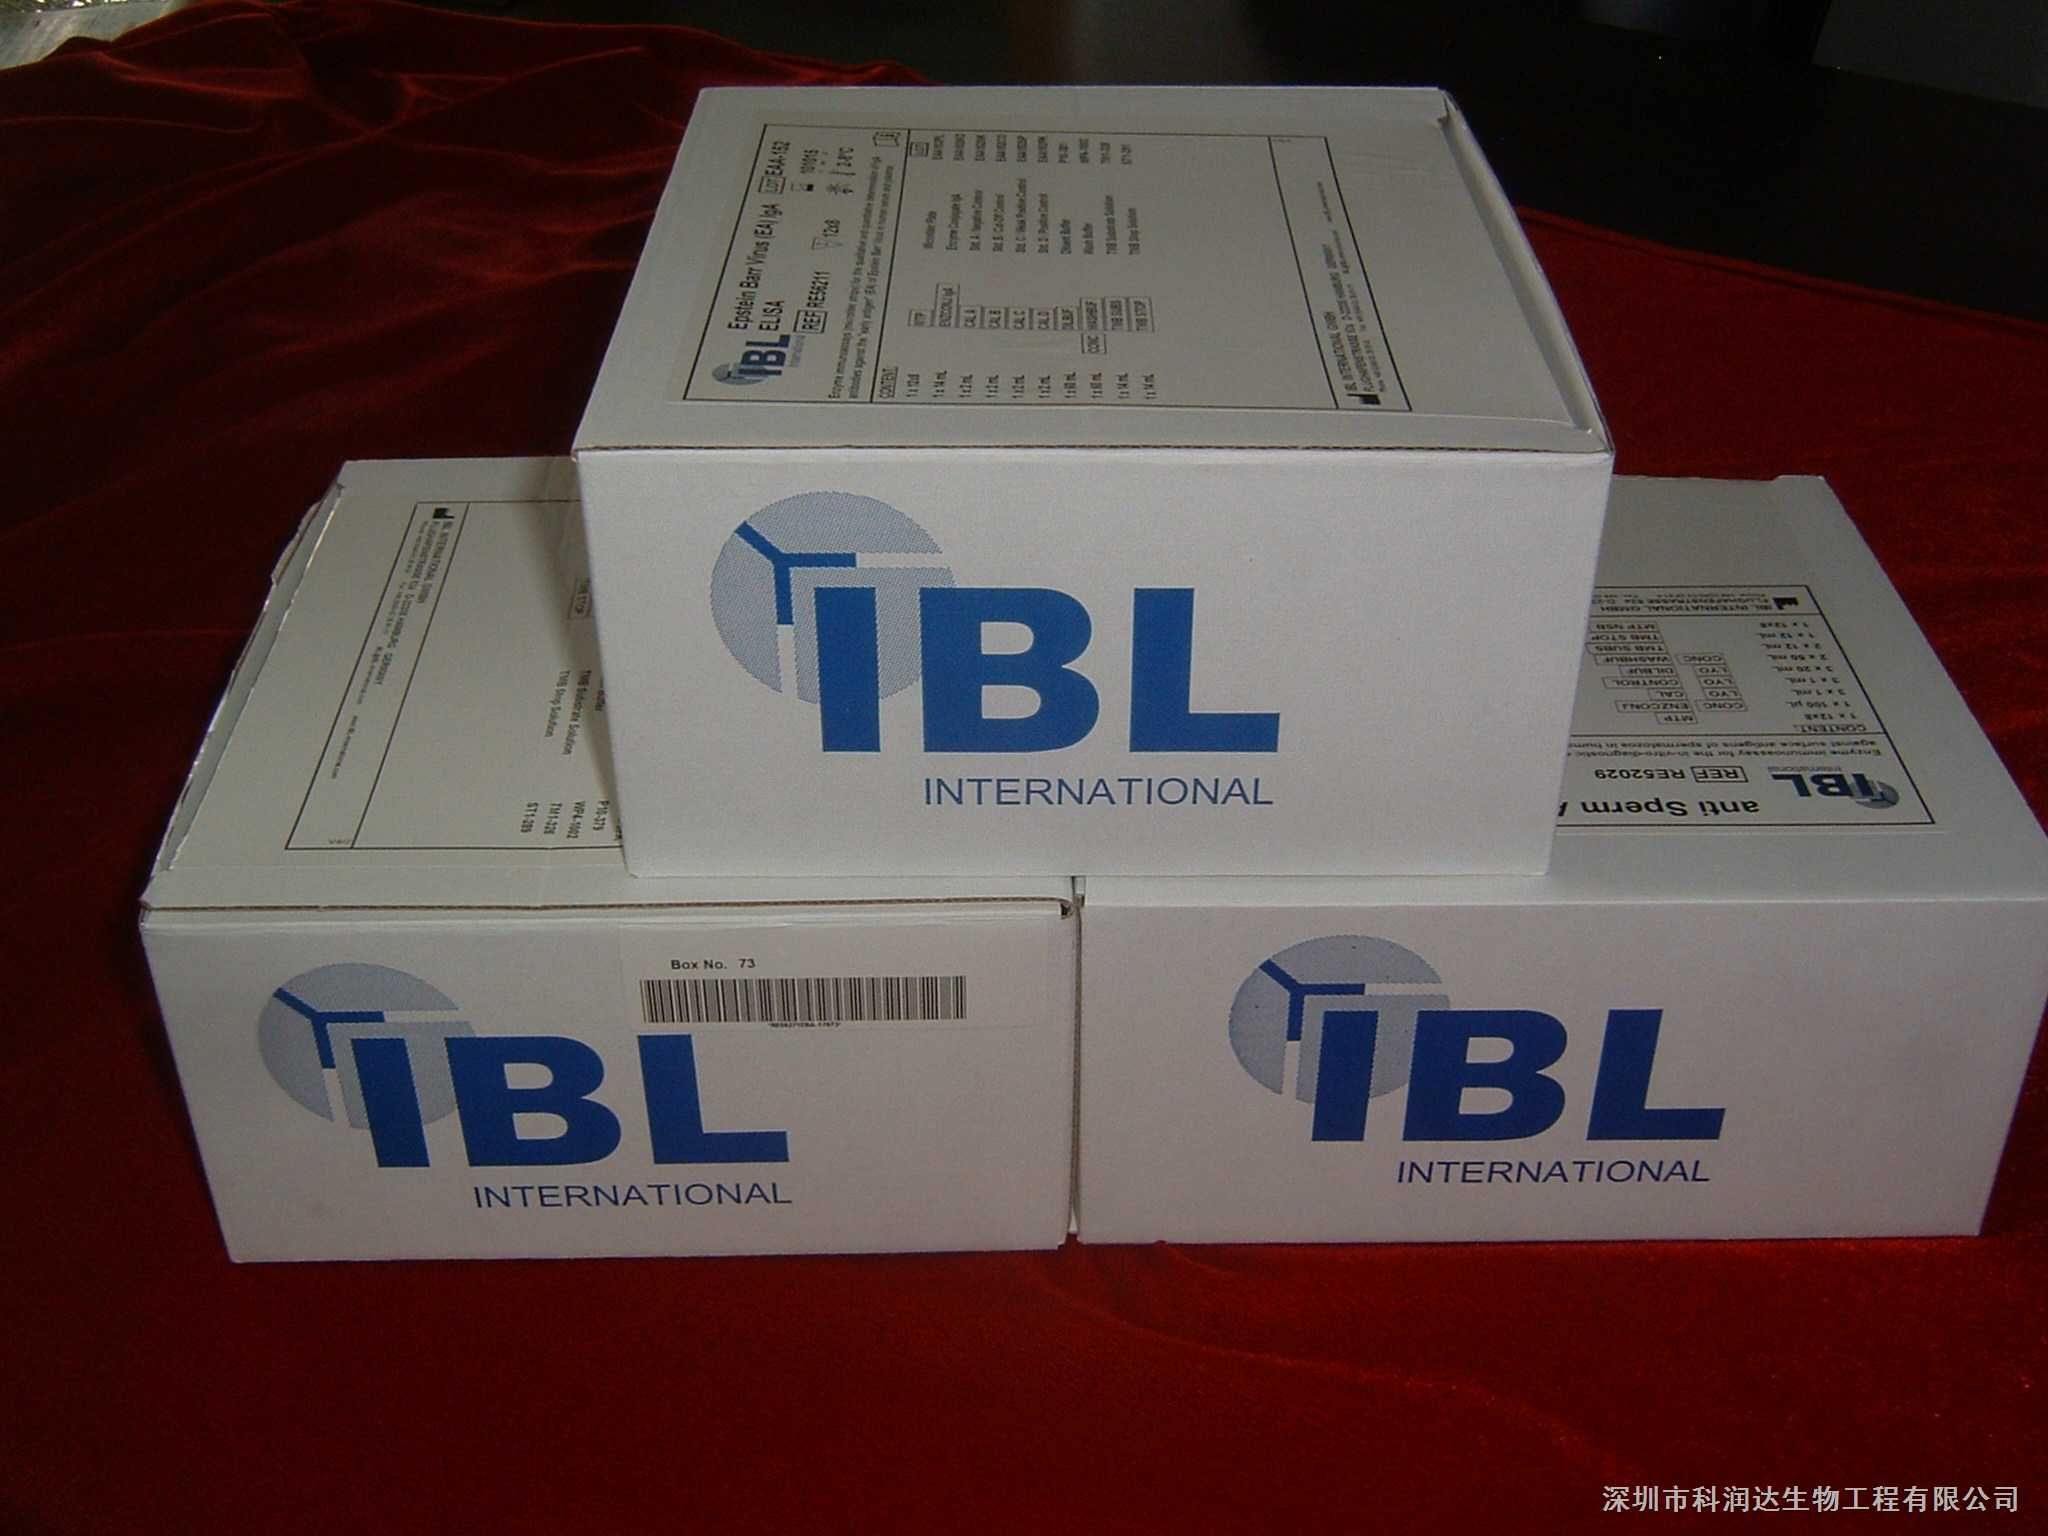 96T-生长相关因子ELISA检测试剂盒